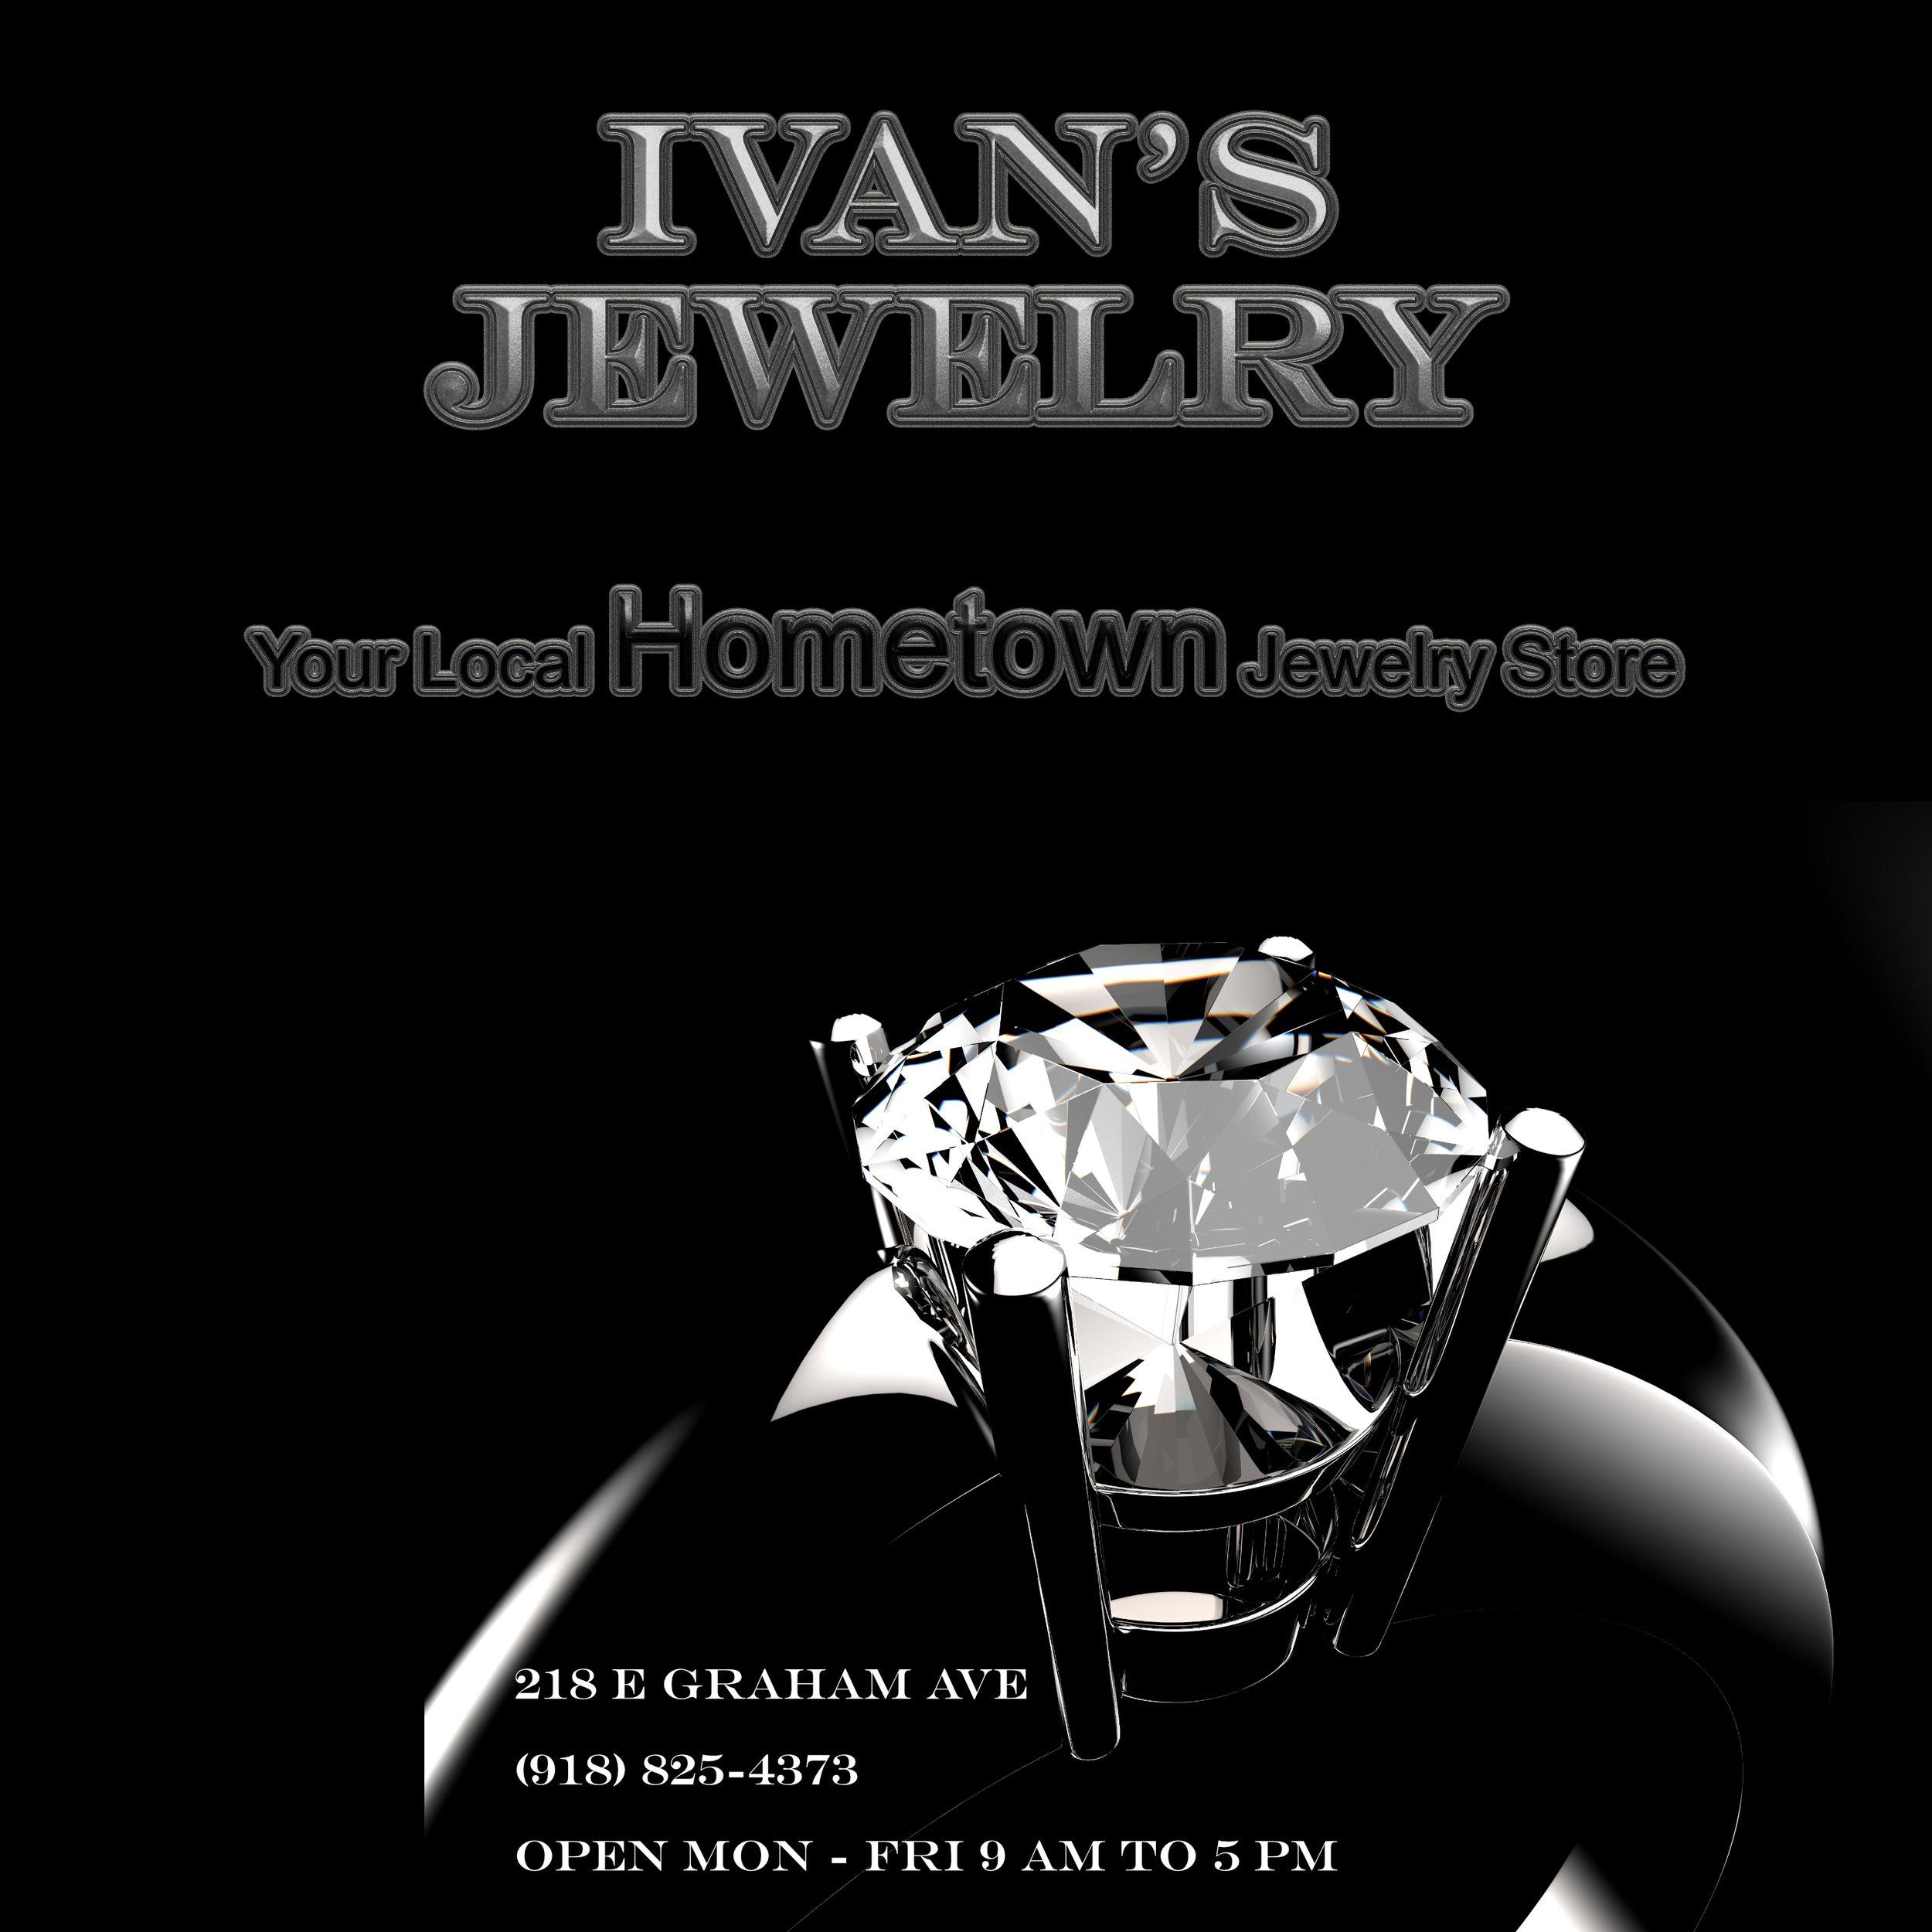 Ivan's Ad.jpg